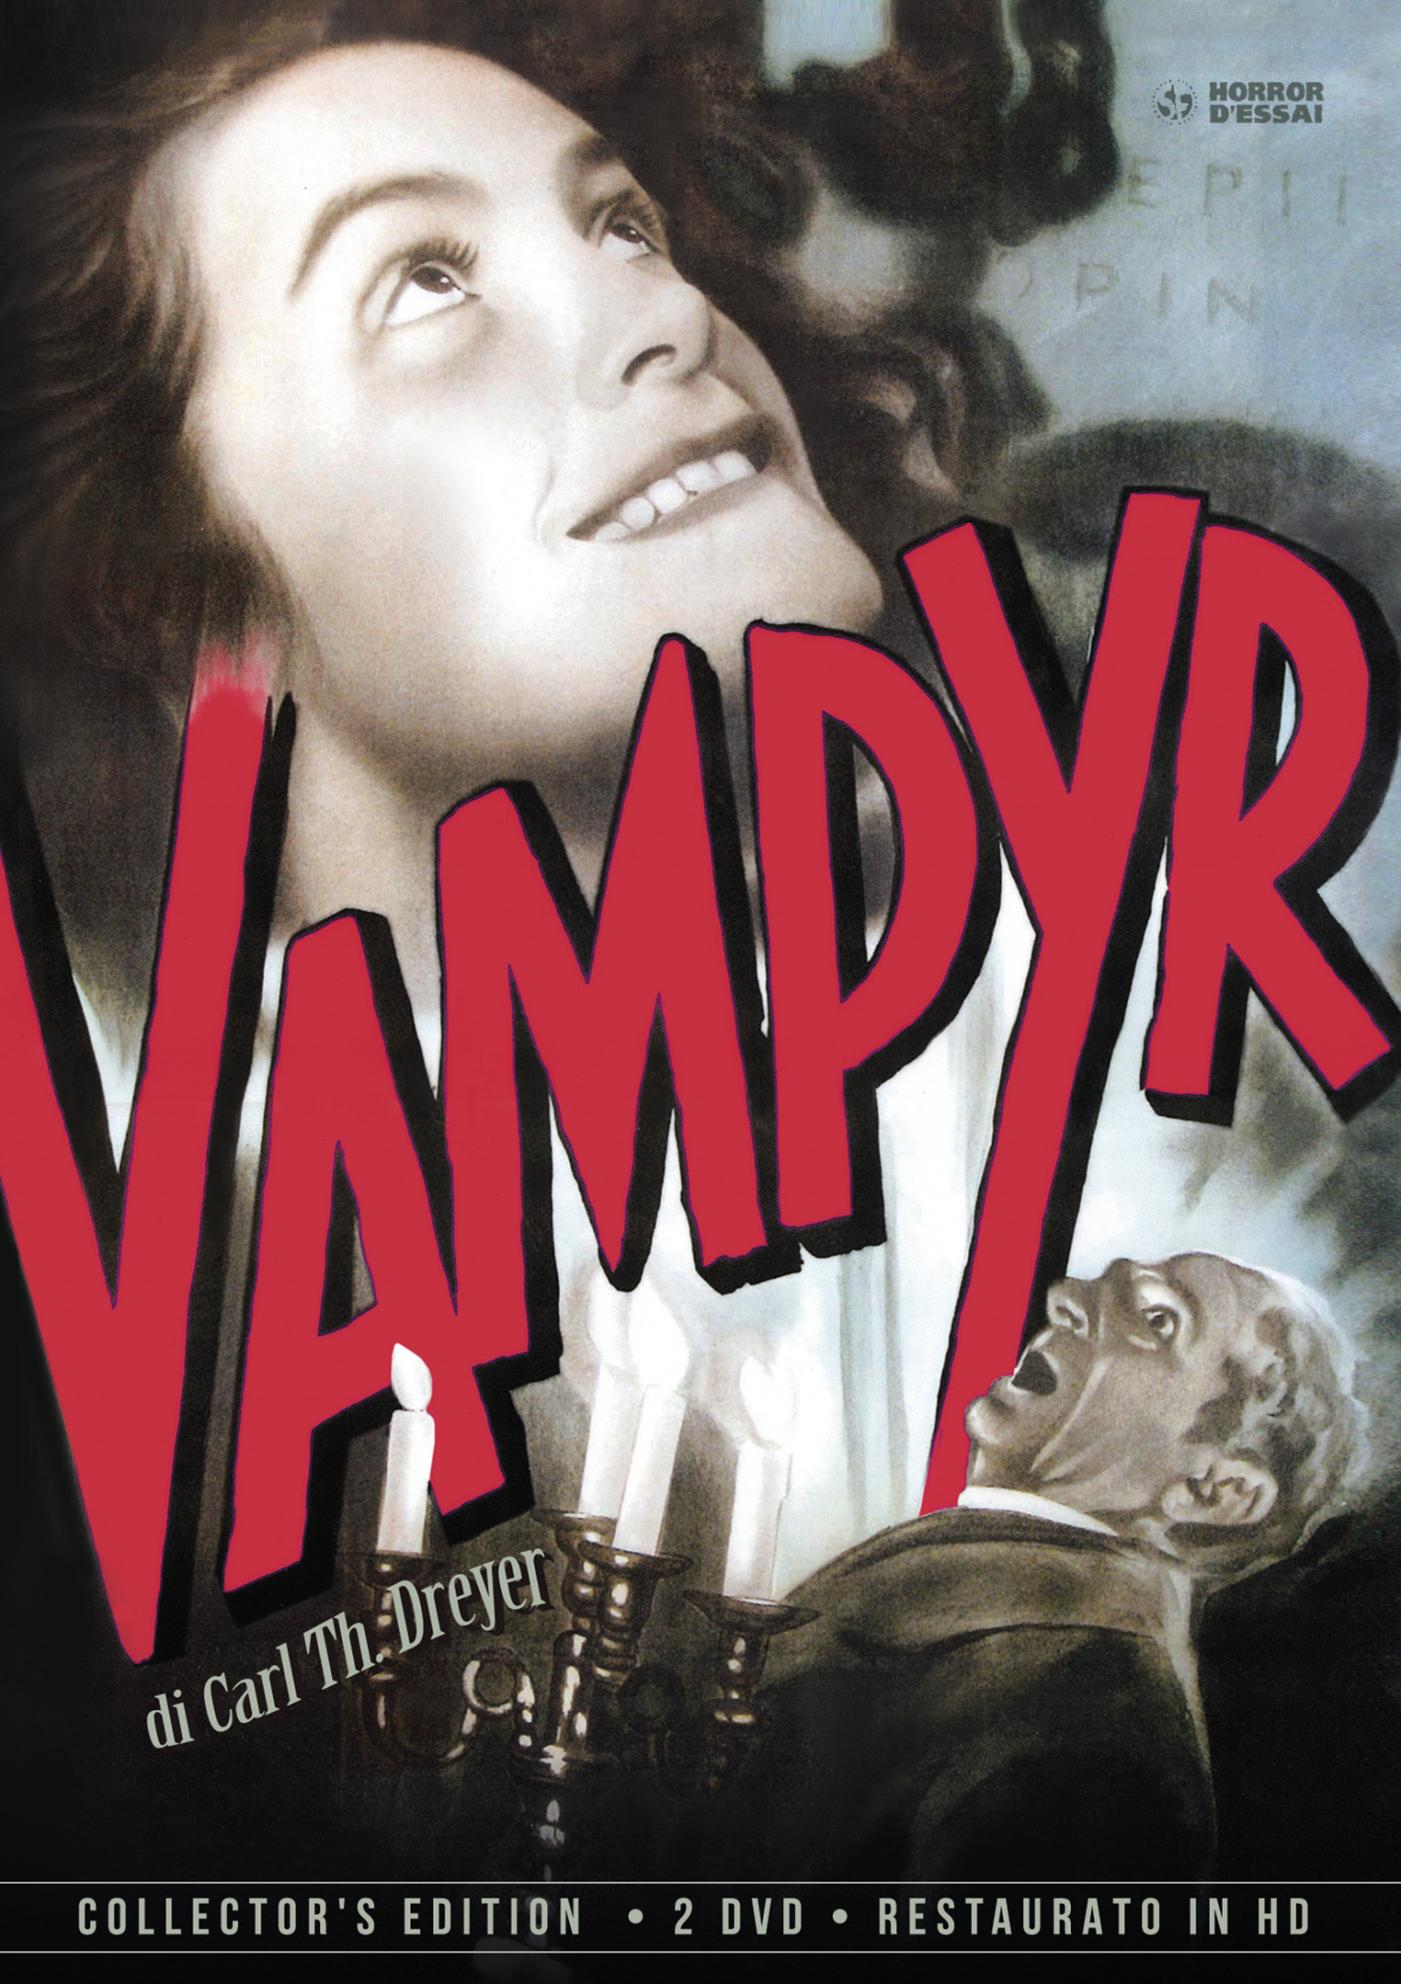 VAMPYR (COLLECTOR'S EDITION) (RESTAURATO IN HD) (2 DVD) (DVD)